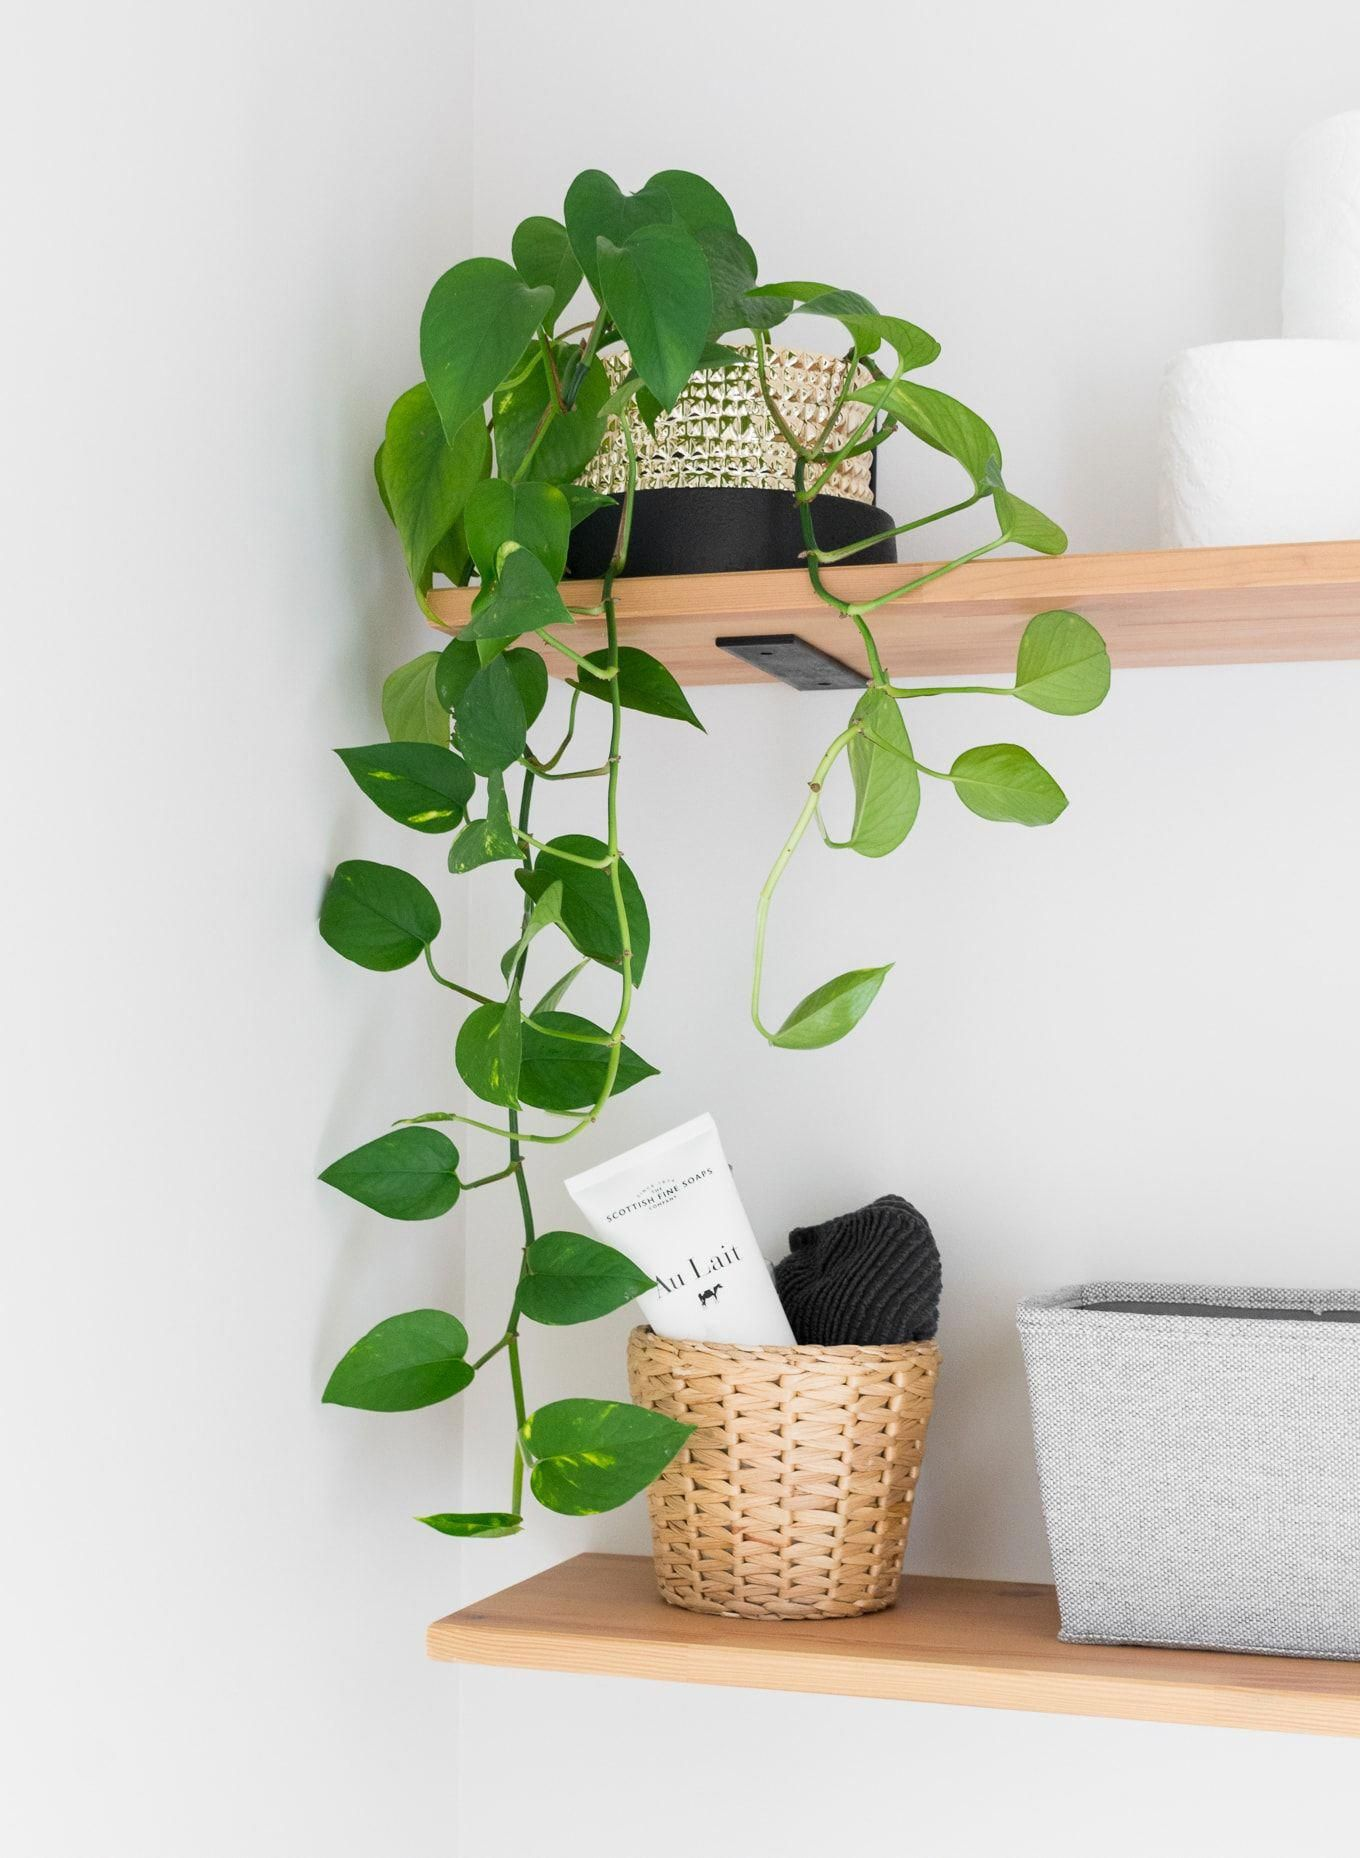 Tiny Powder Room Decorating Ideas: Modern Half Bath Updates for $100 #modernpowderrooms